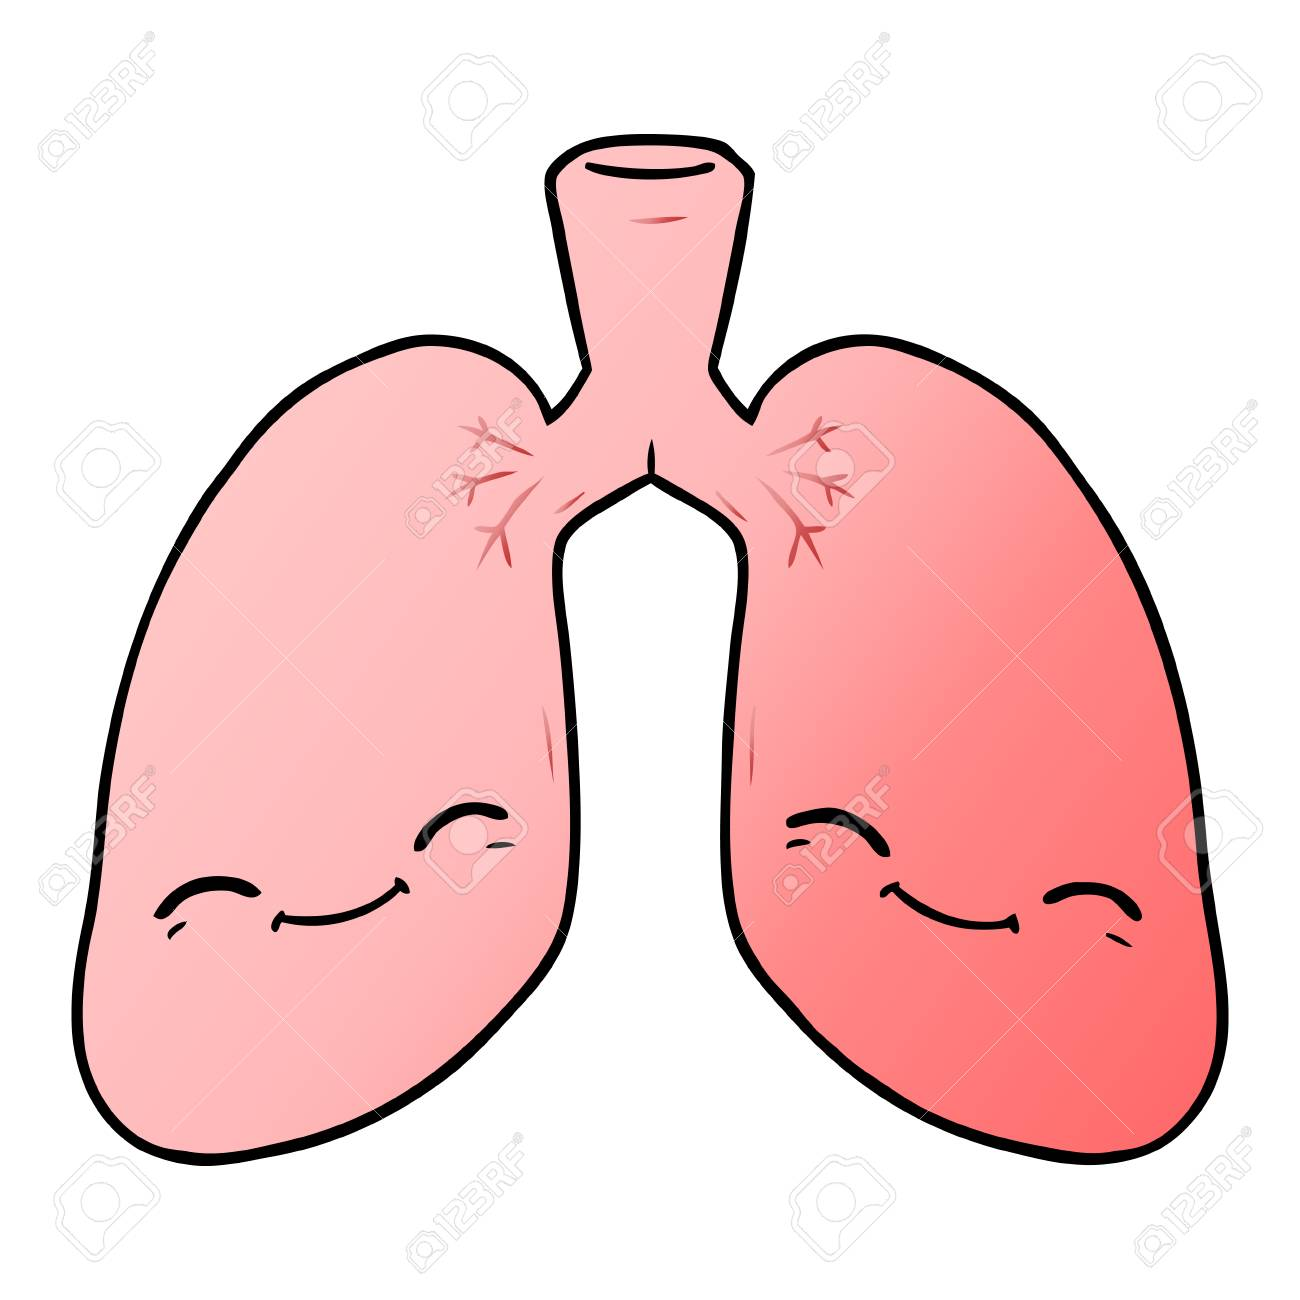 95545053-cartoon-lungs-illustration-design-